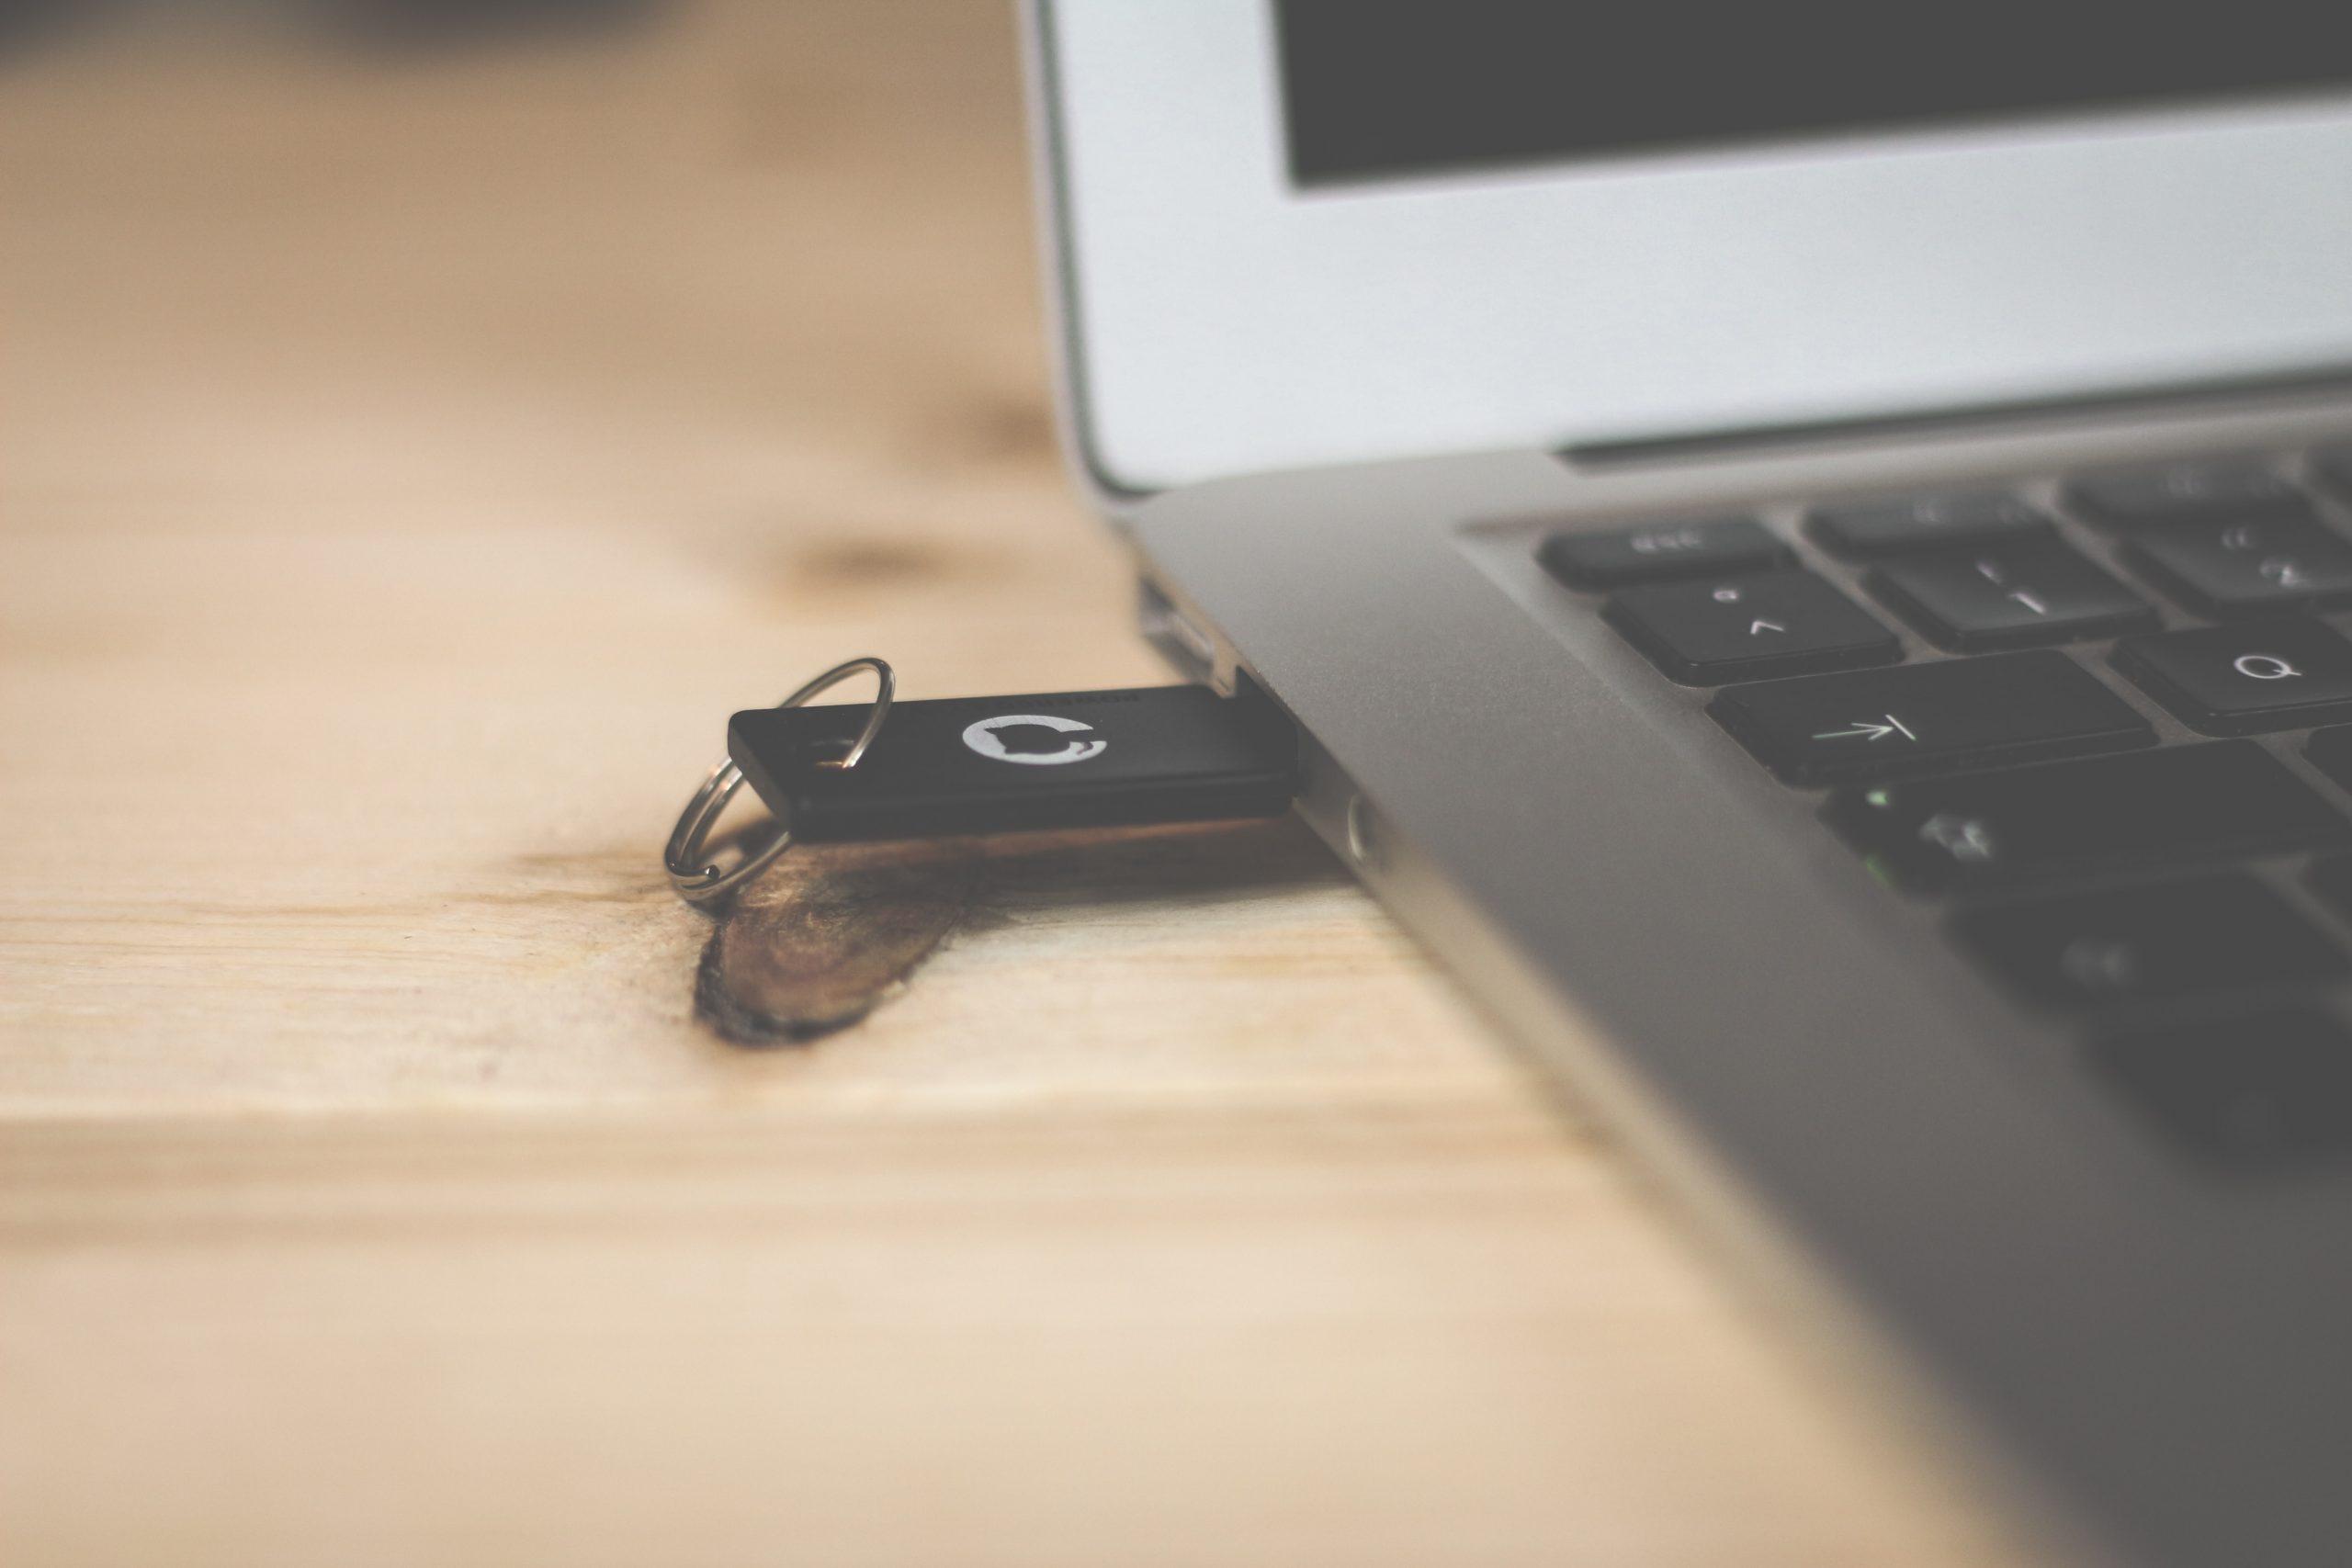 Adapatador wireless USB conectado no notebook.